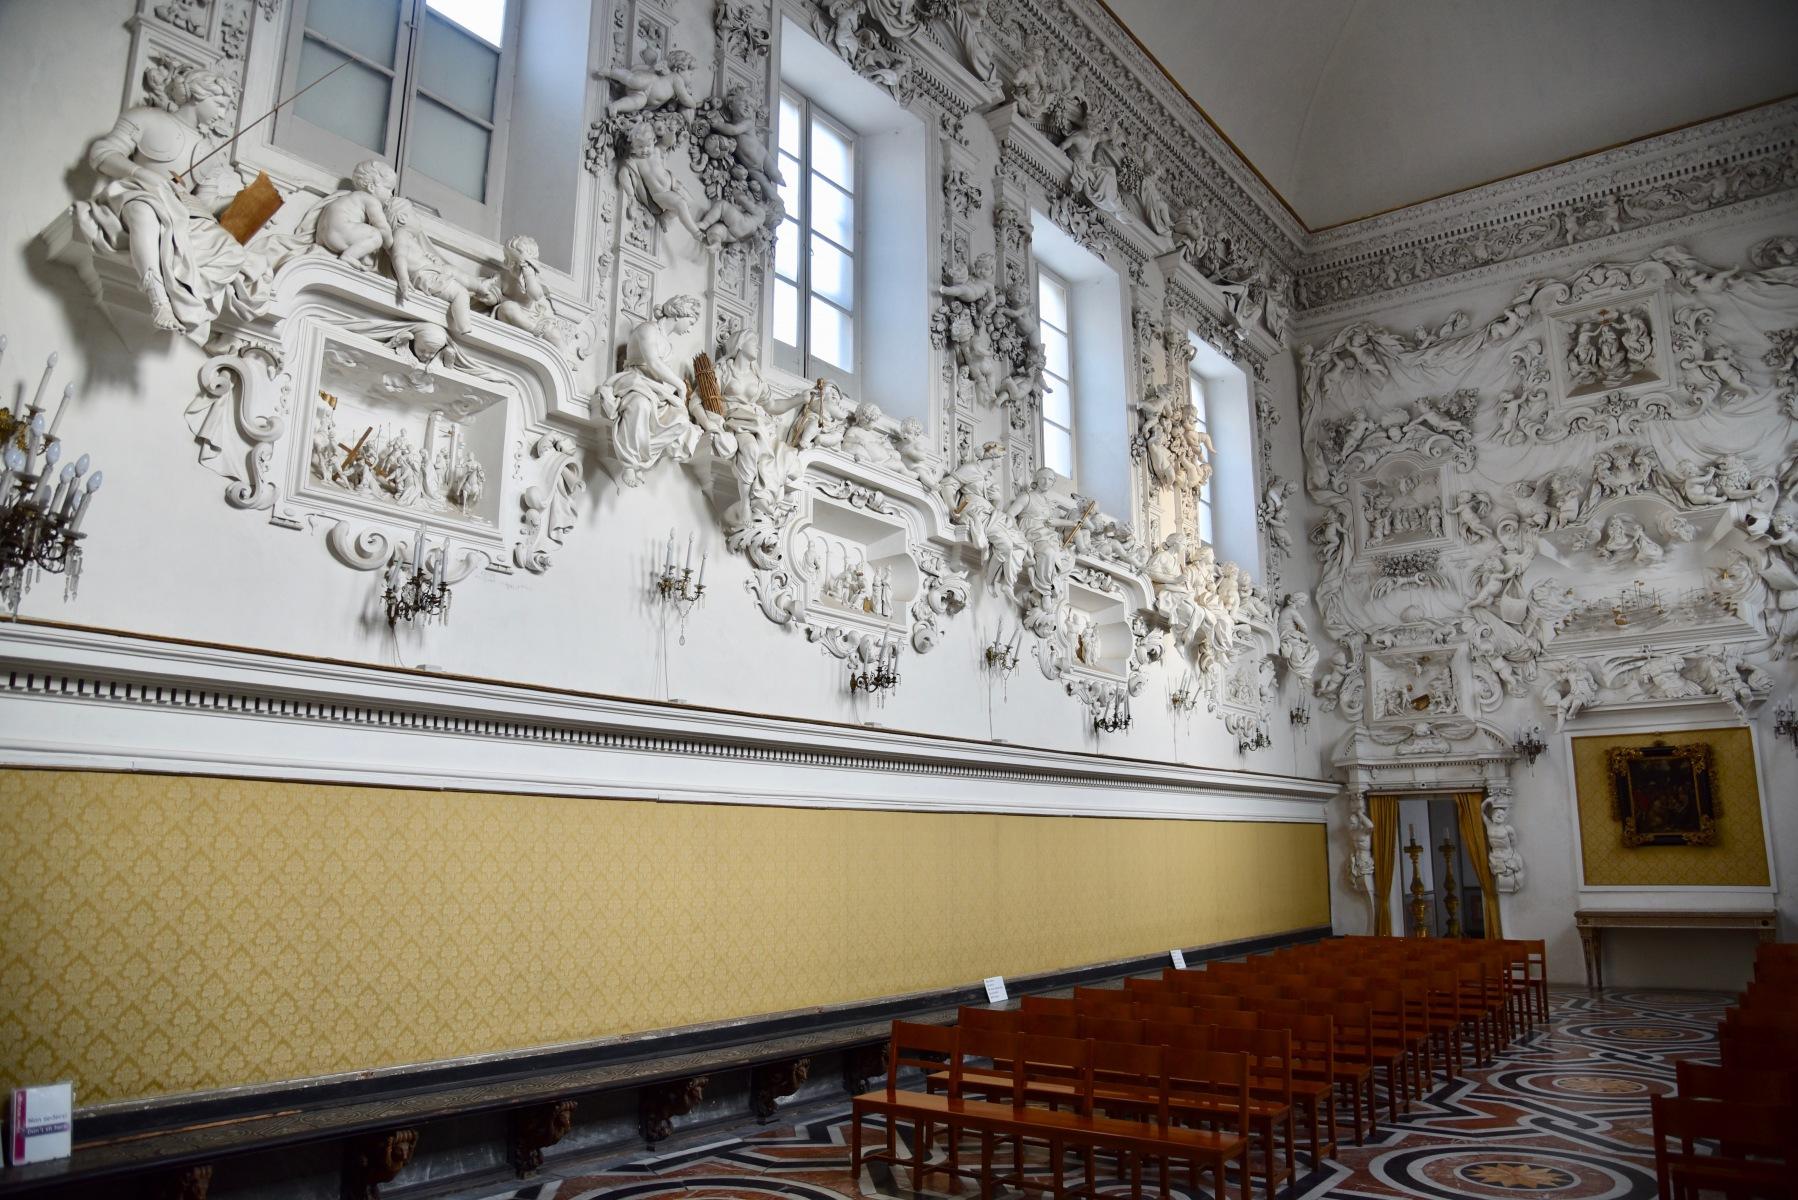 Oratorio-Santa-Cita-parete-con-teatrini-1